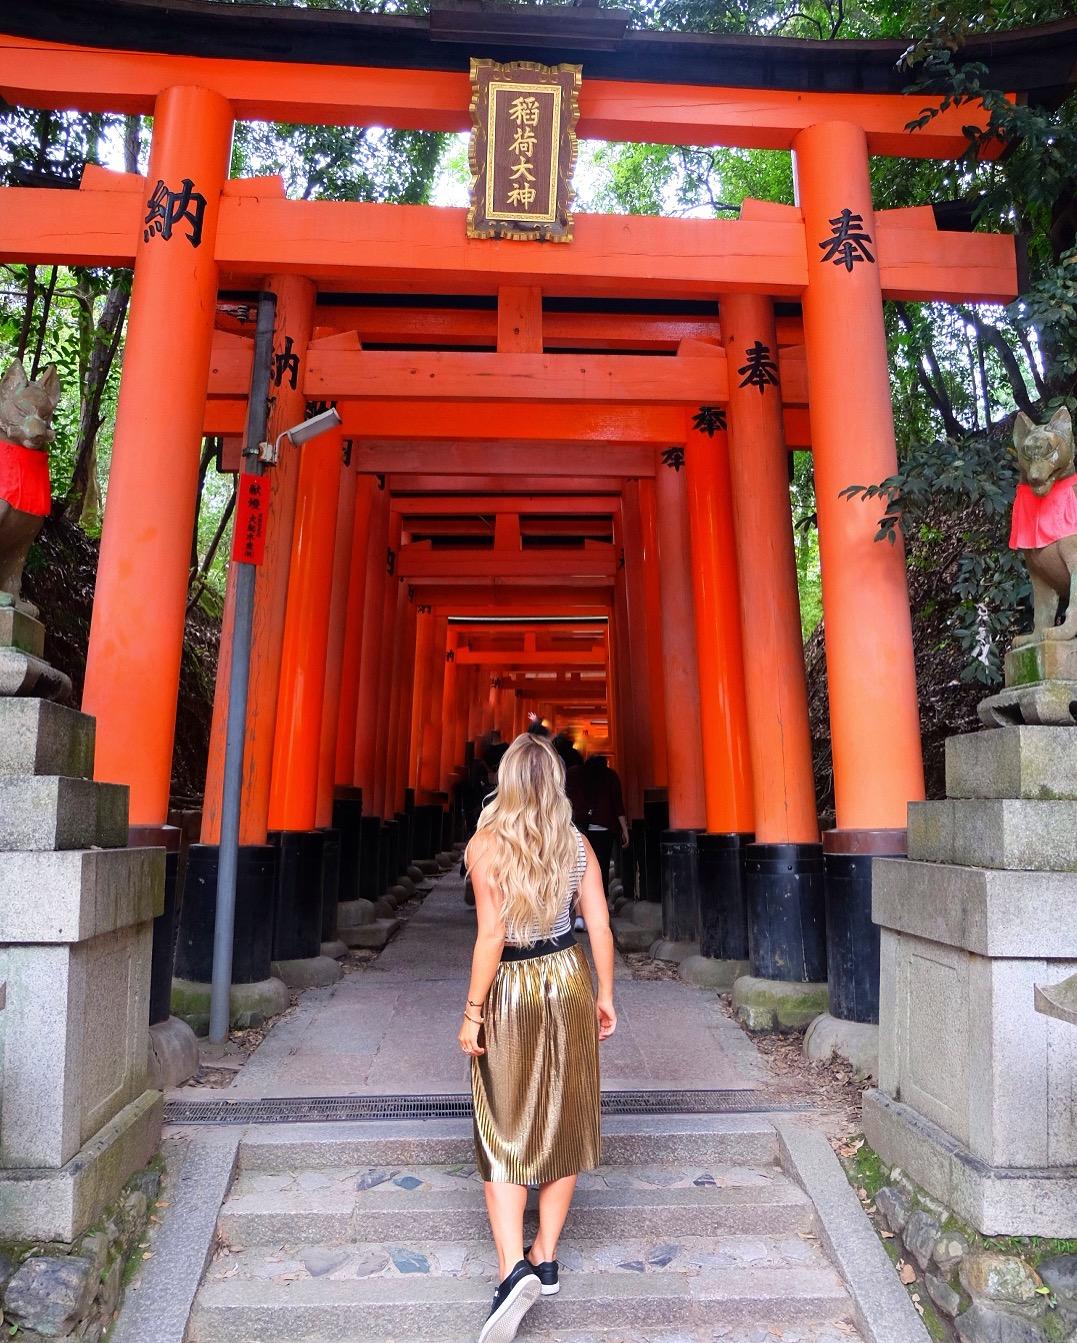 The endless torii gates at the Fushimi-Inari Shrine